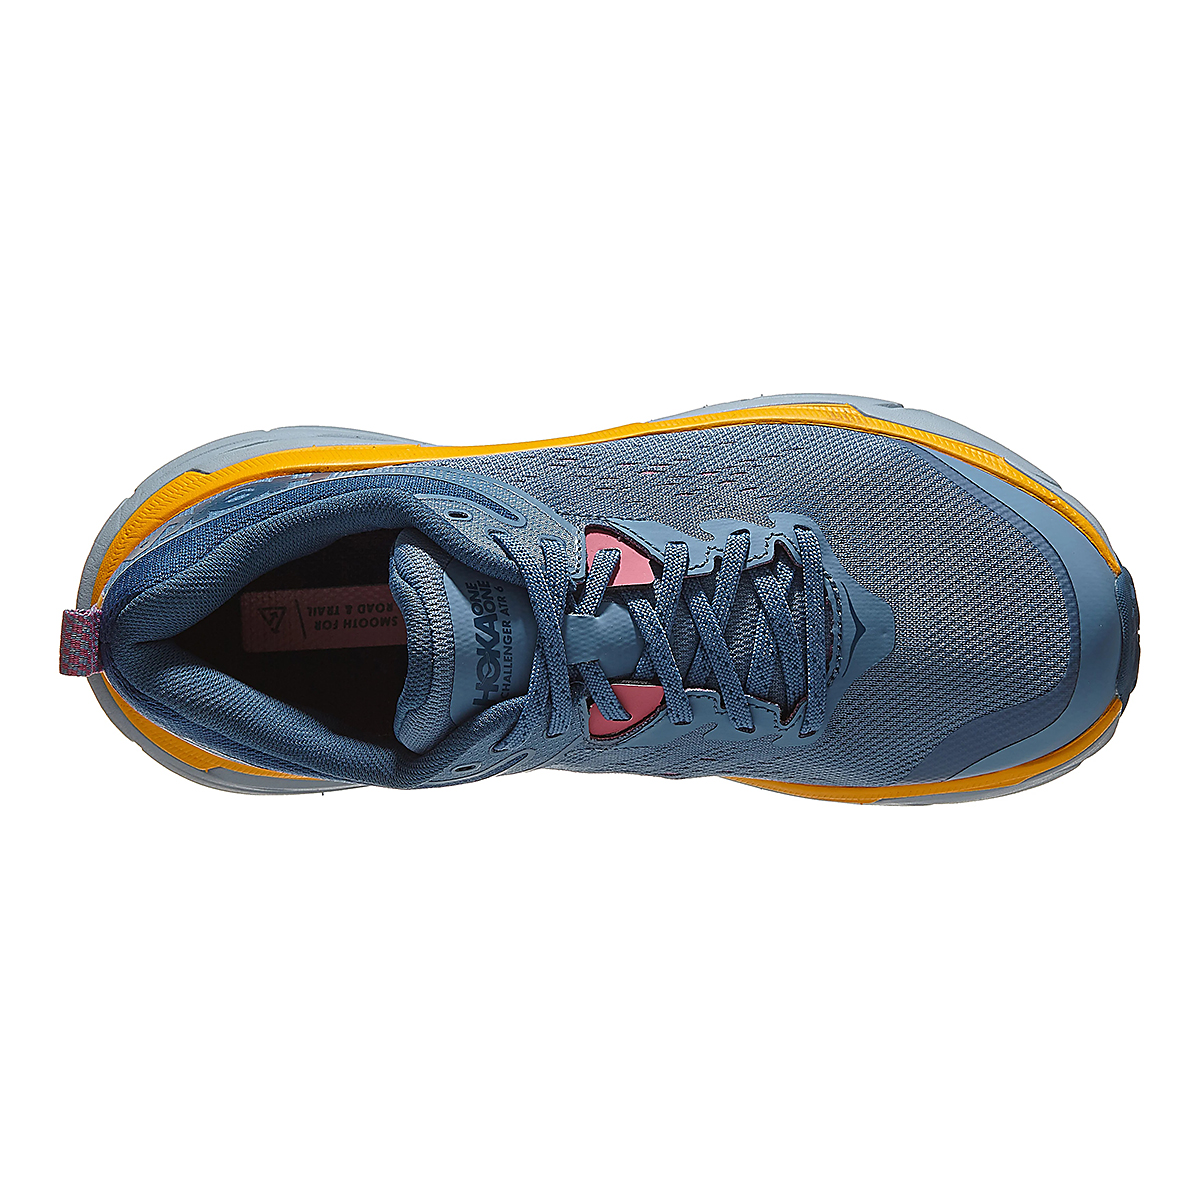 Women's Hoka One One Challenger ATR 6 Running Shoe - Color: Provincial Blue/Saffron - Size: 5 - Width: Wide, Provincial Blue/Saffron, large, image 4